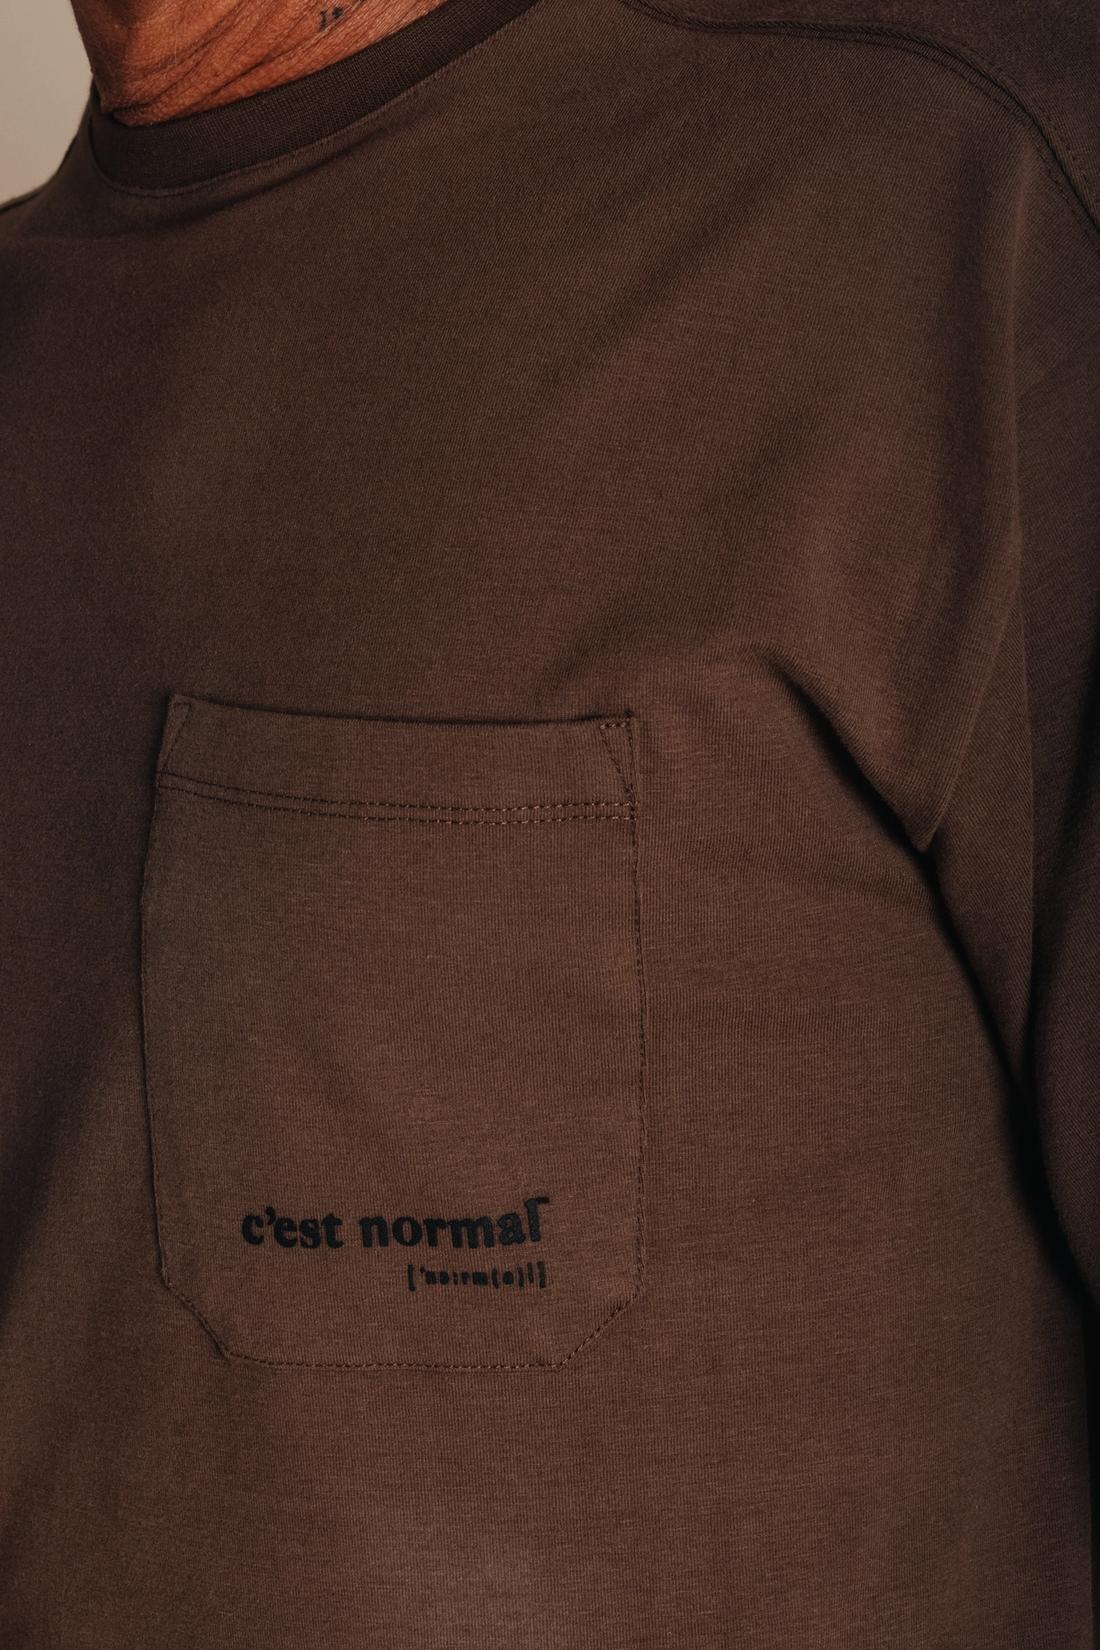 The Proper T-Shirt